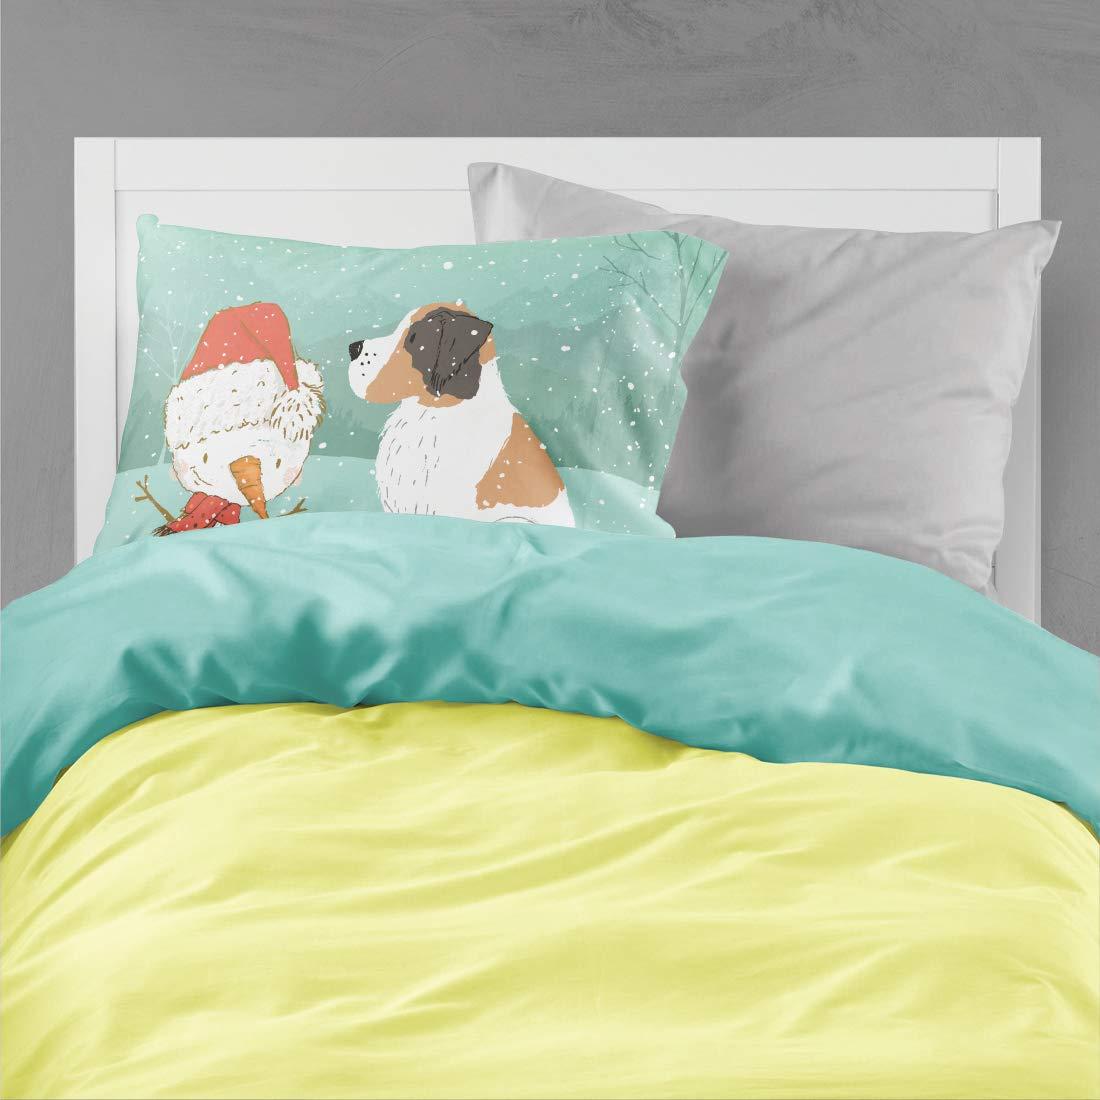 Carolines Treasures Black Greyhound Snowman Christmas Fabric Standard Pillowcase,